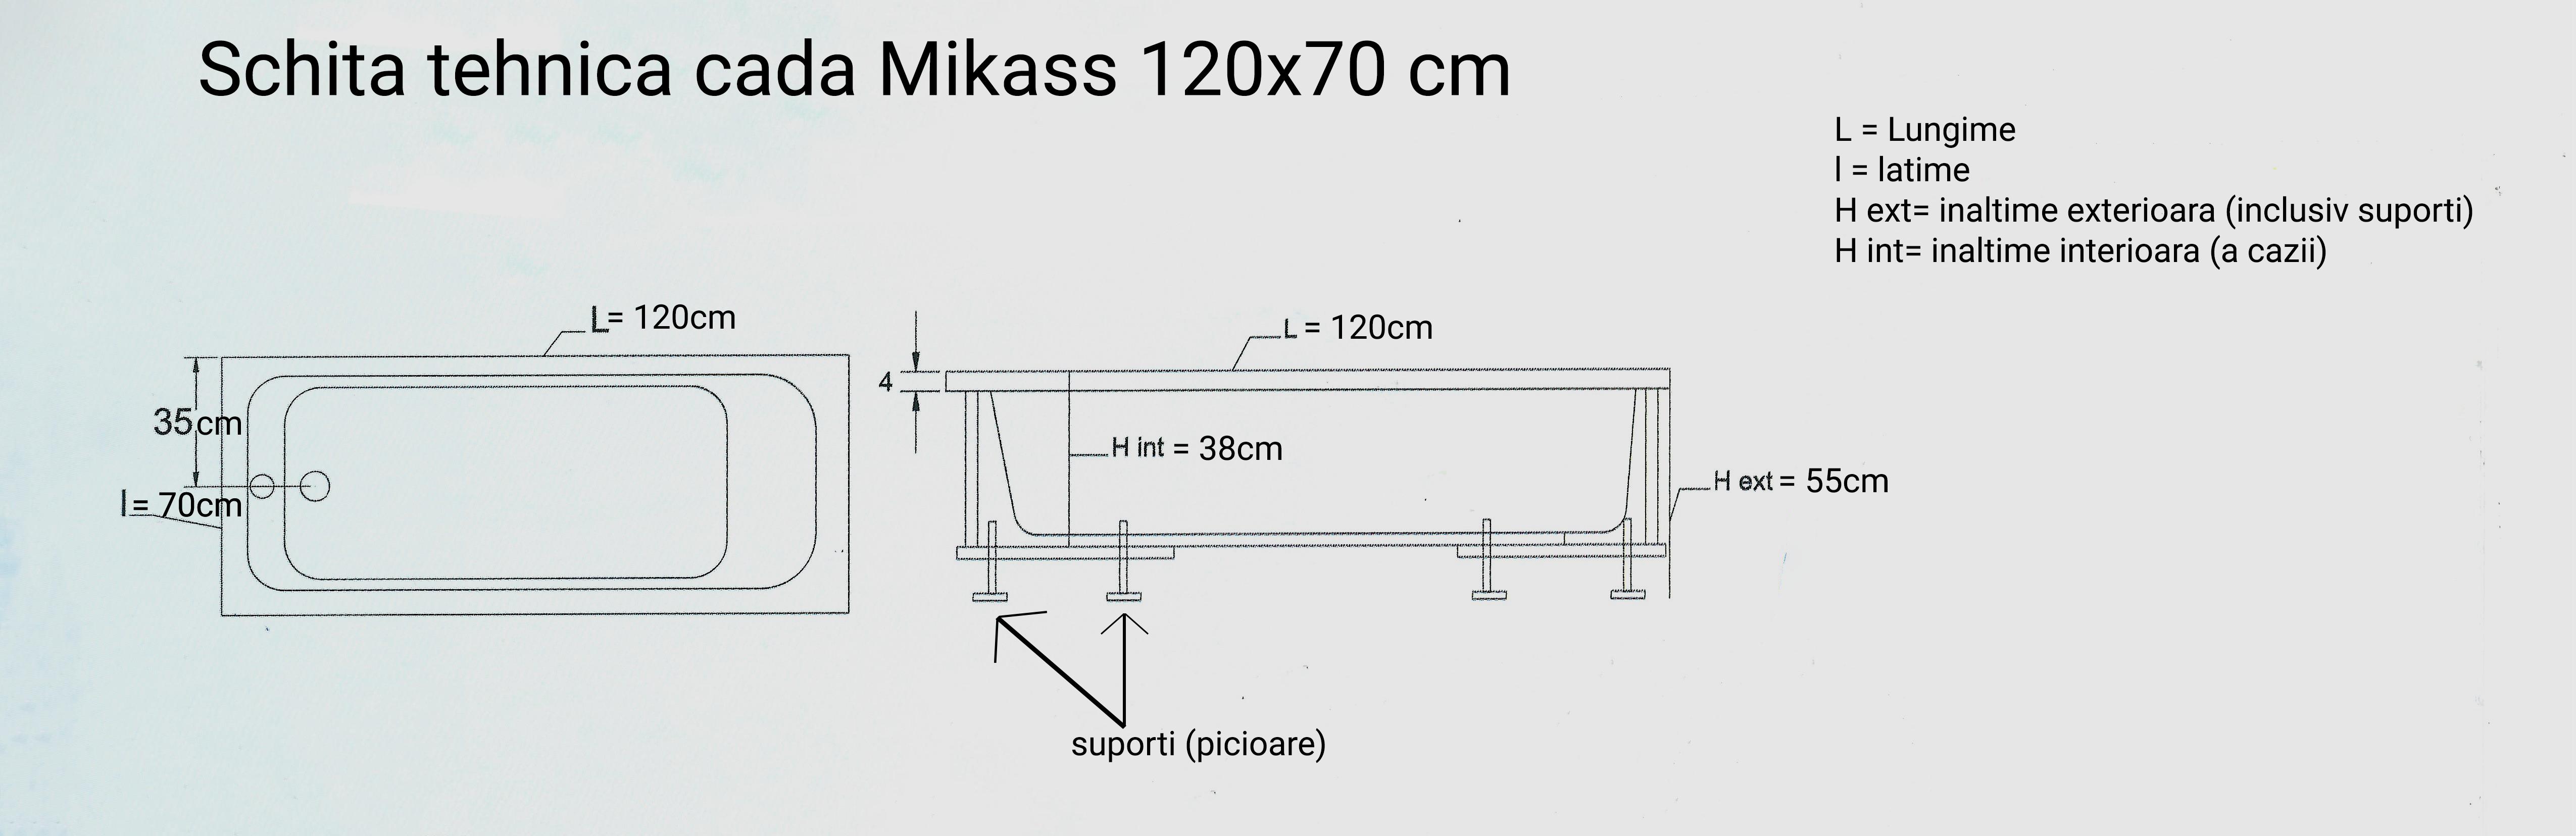 schita tehnica cada 120 70 cm mikass